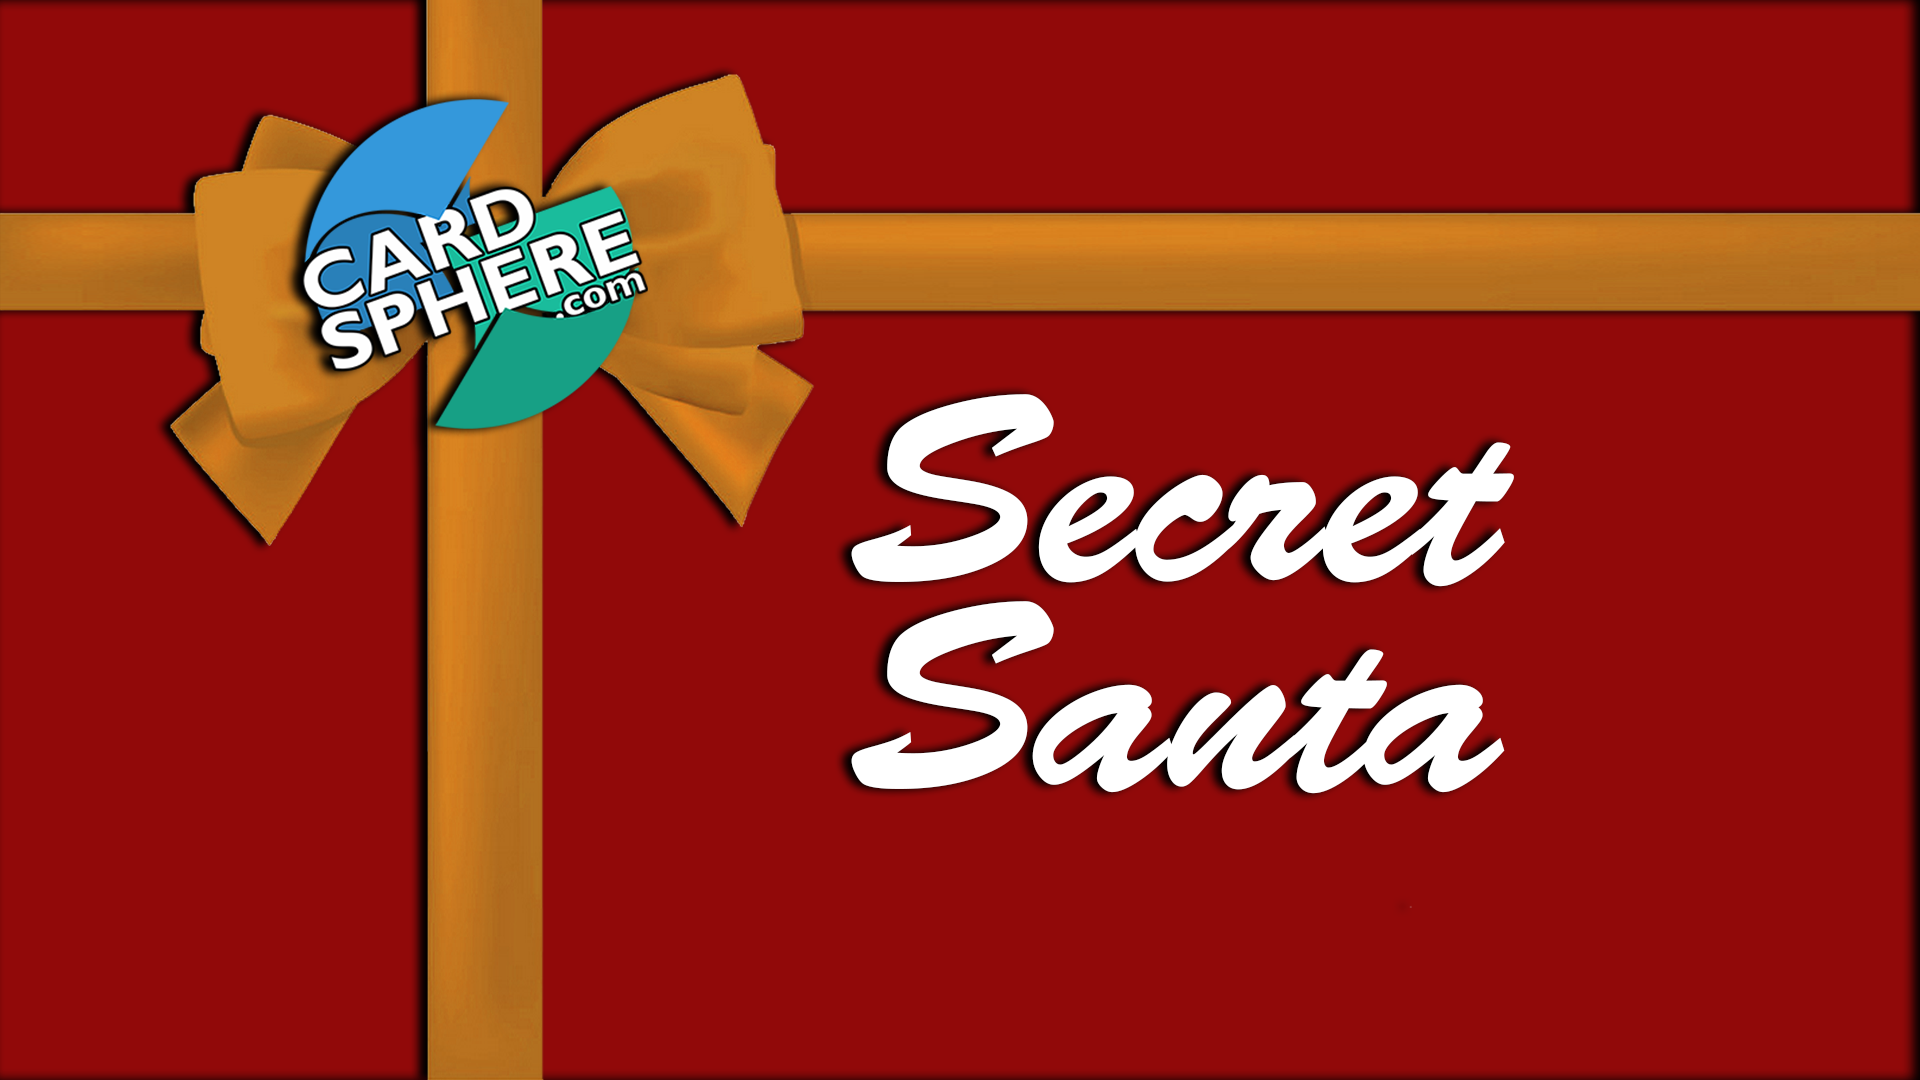 Cardsphere's 5th Annual Secret Santa